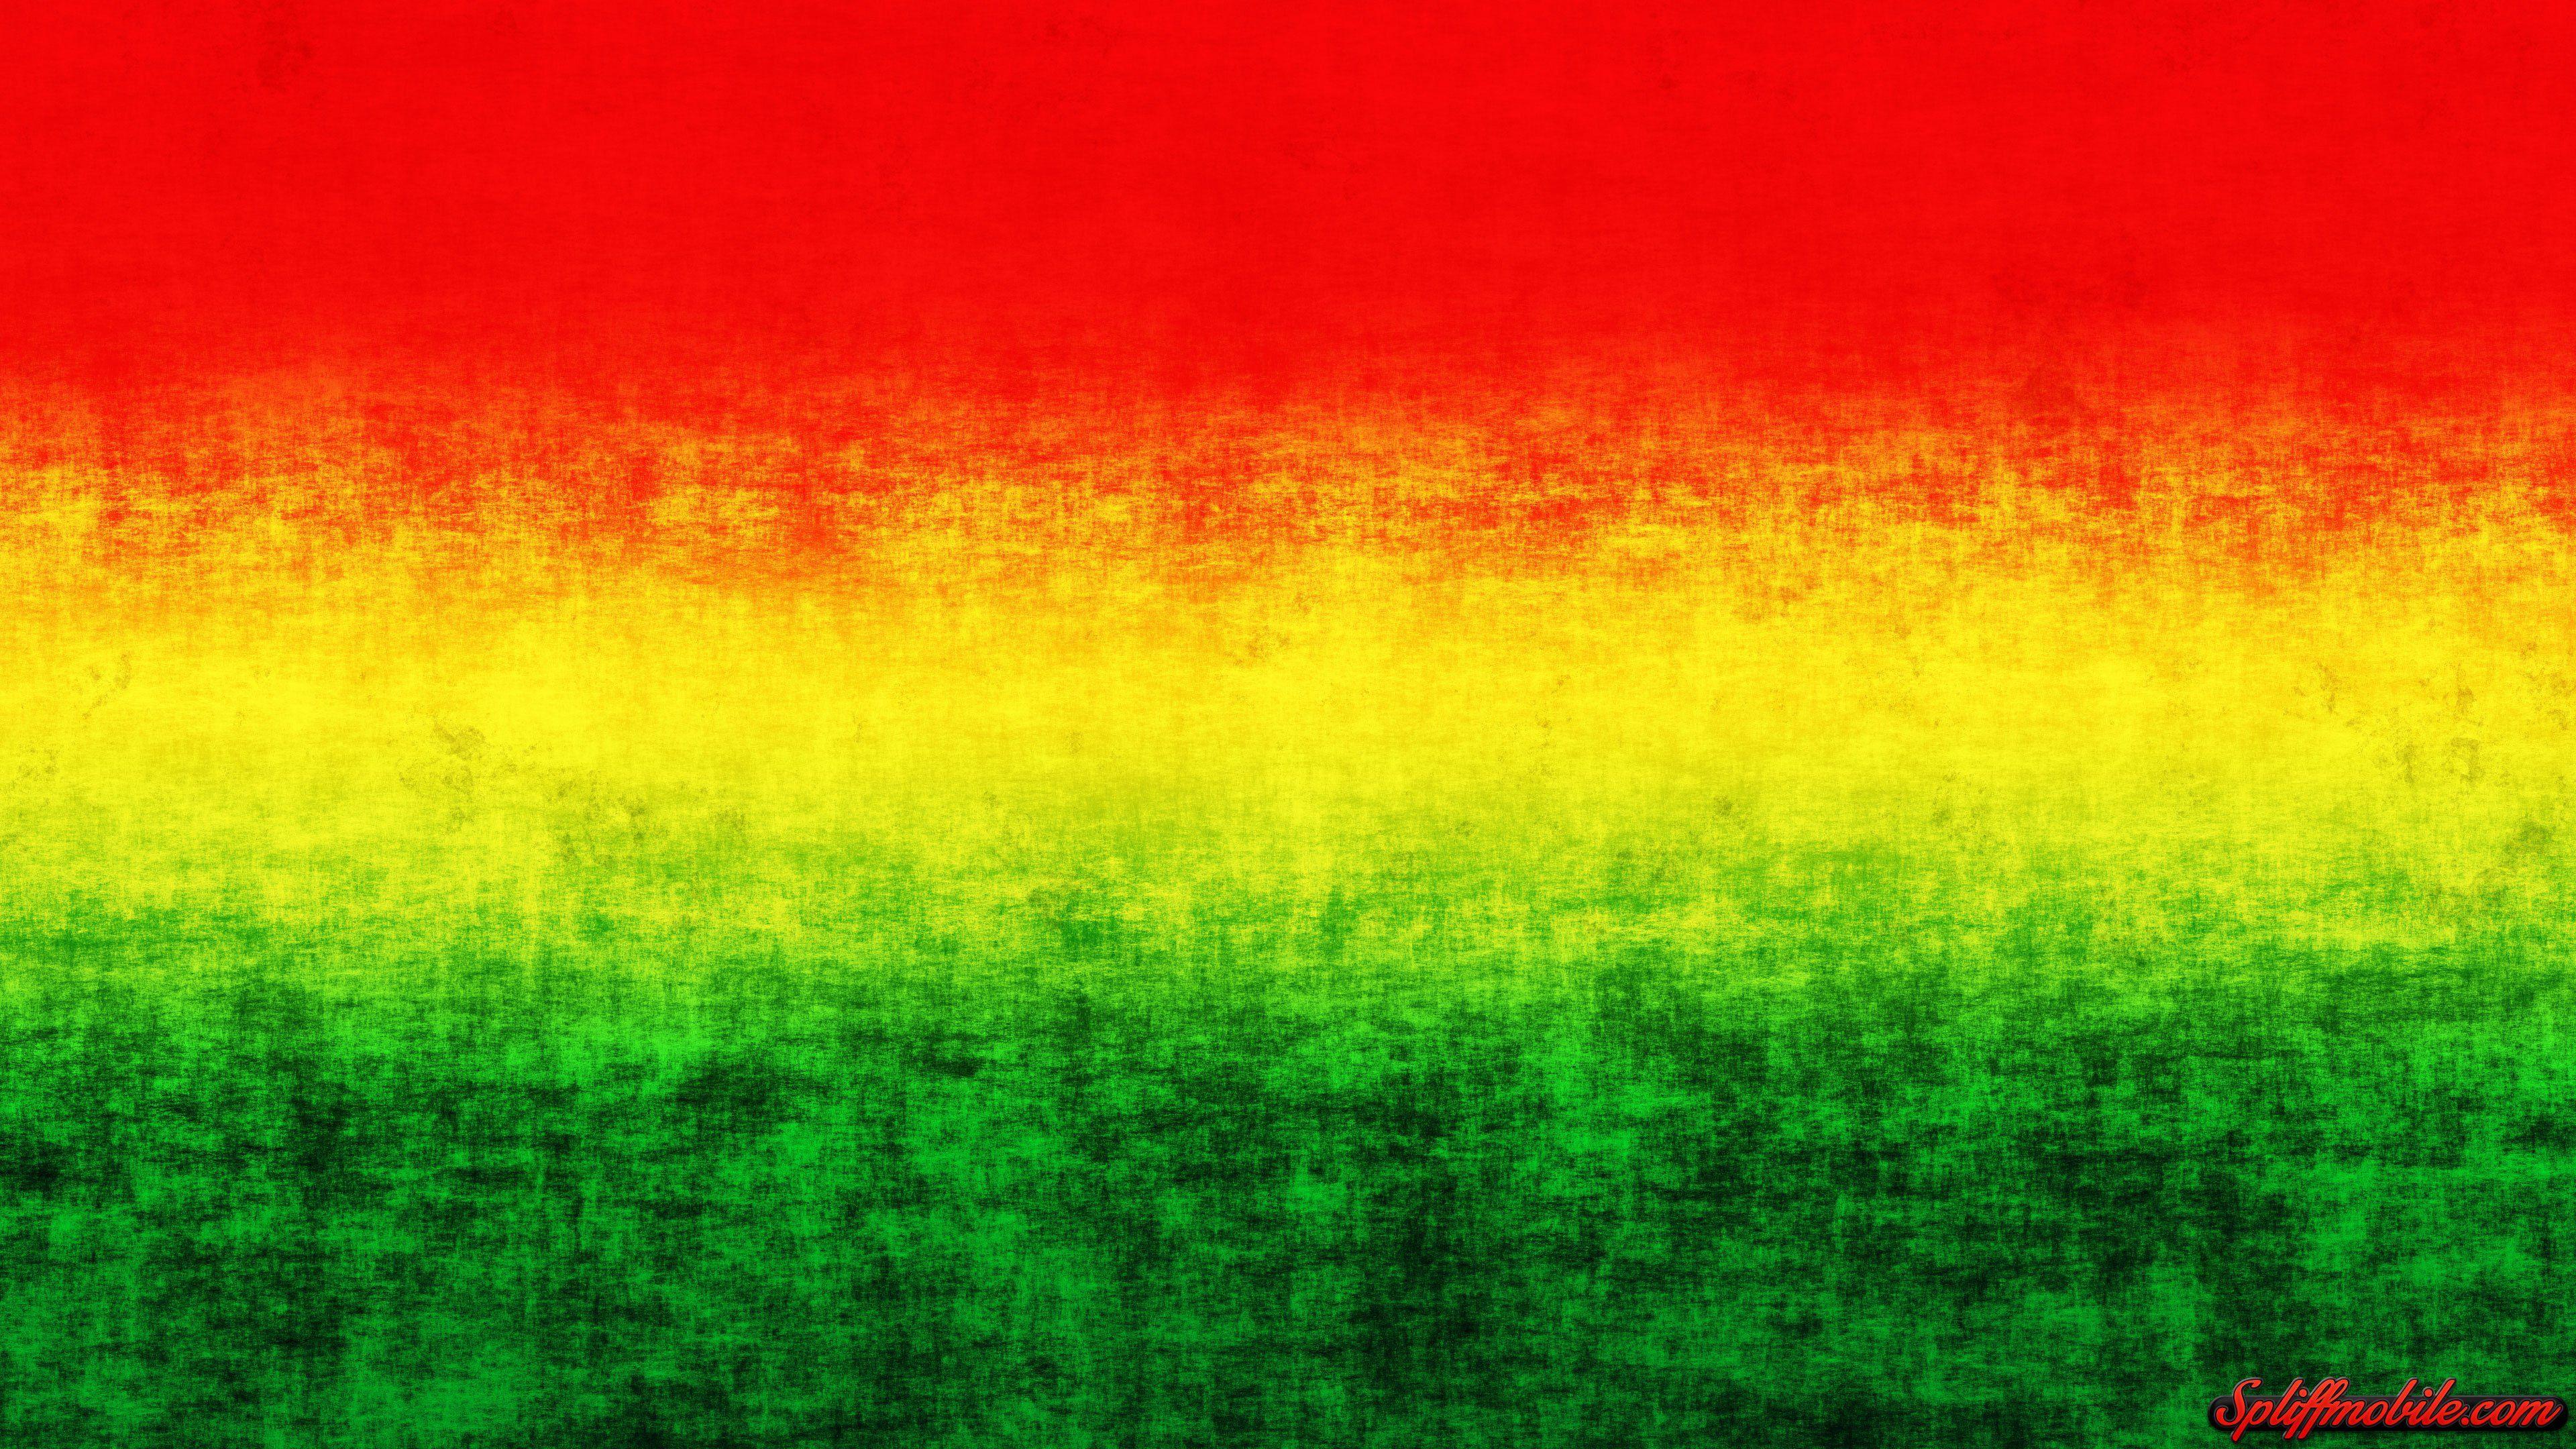 Bob Marley Colors Wallpaper High Quality Resolution Desktop Wallpaper Box Bob Marley Colors Background Hd Wallpaper Colorful Wallpaper